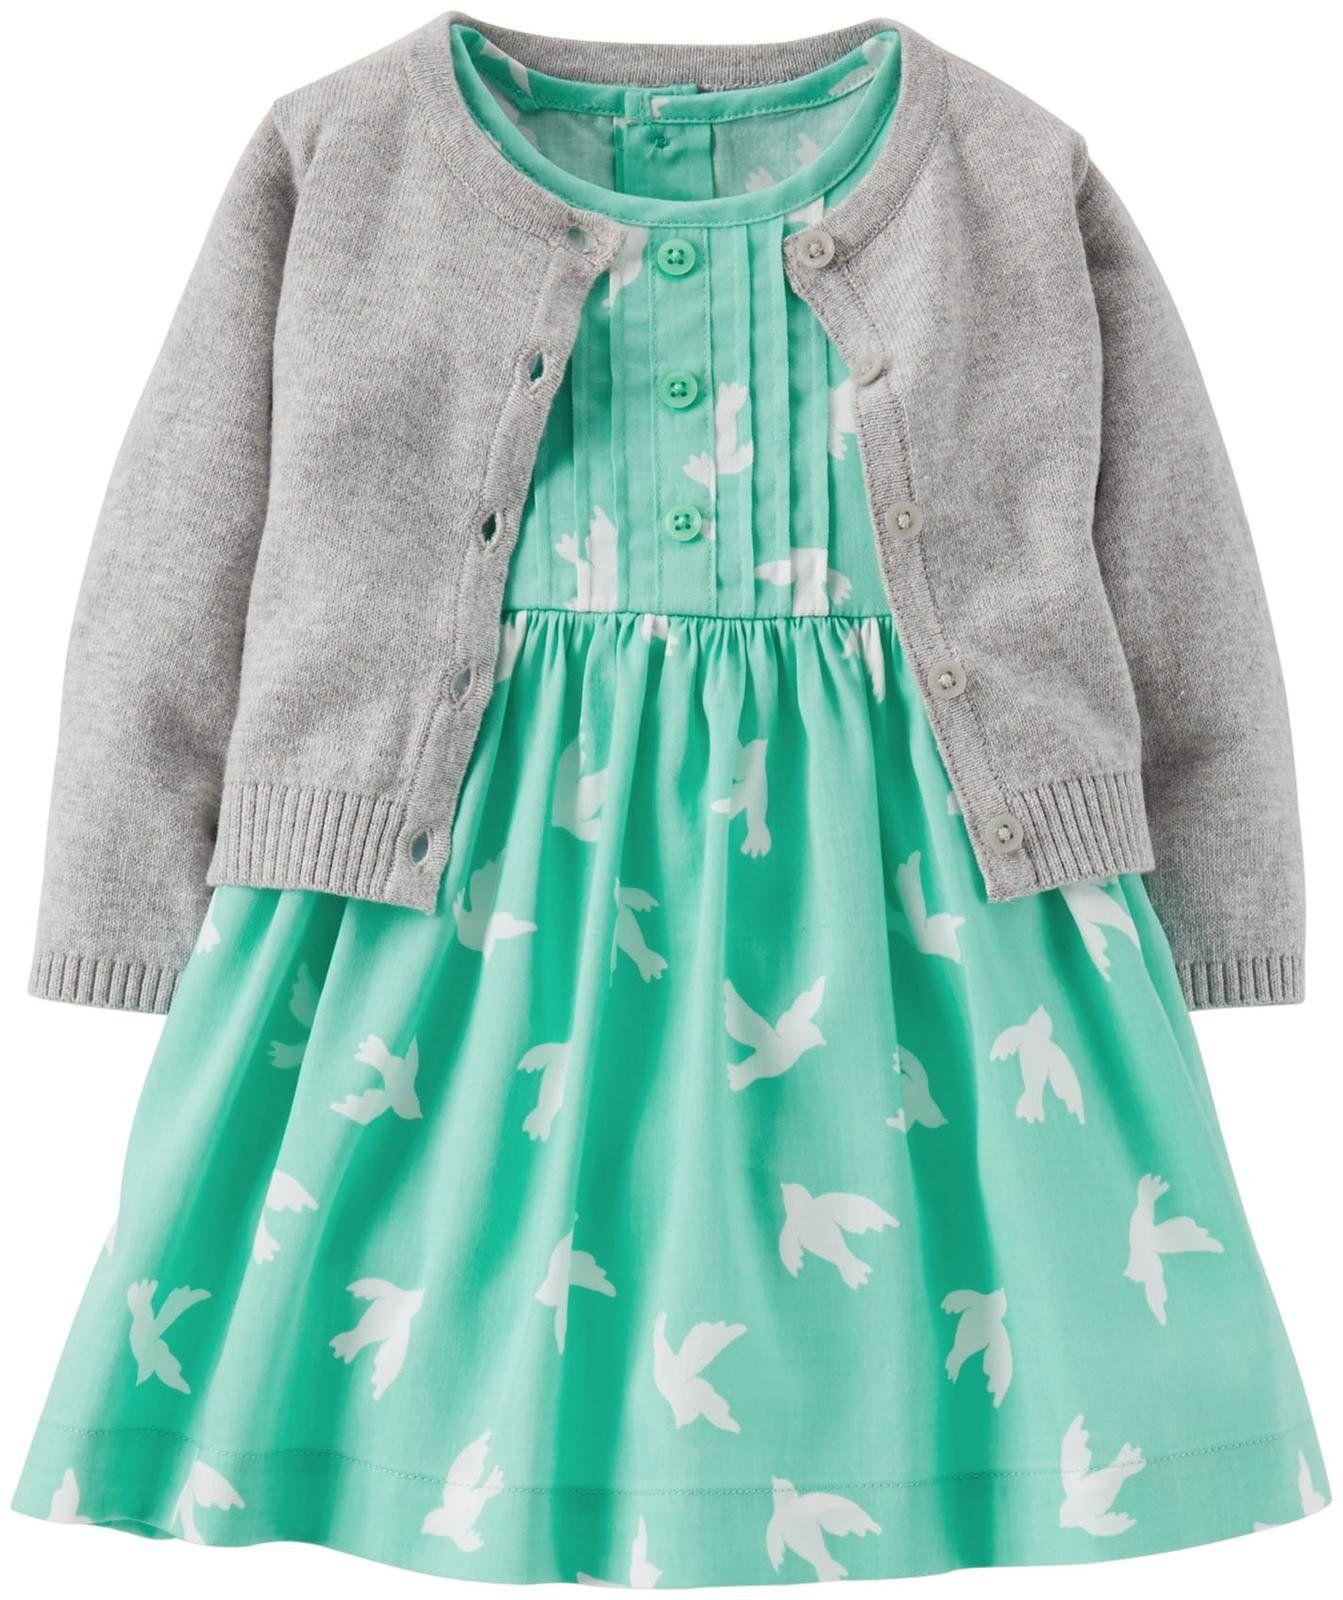 Carter's 2 Piece Cardigan/Dress Set (Baby) - Turquoise - Free Shipping